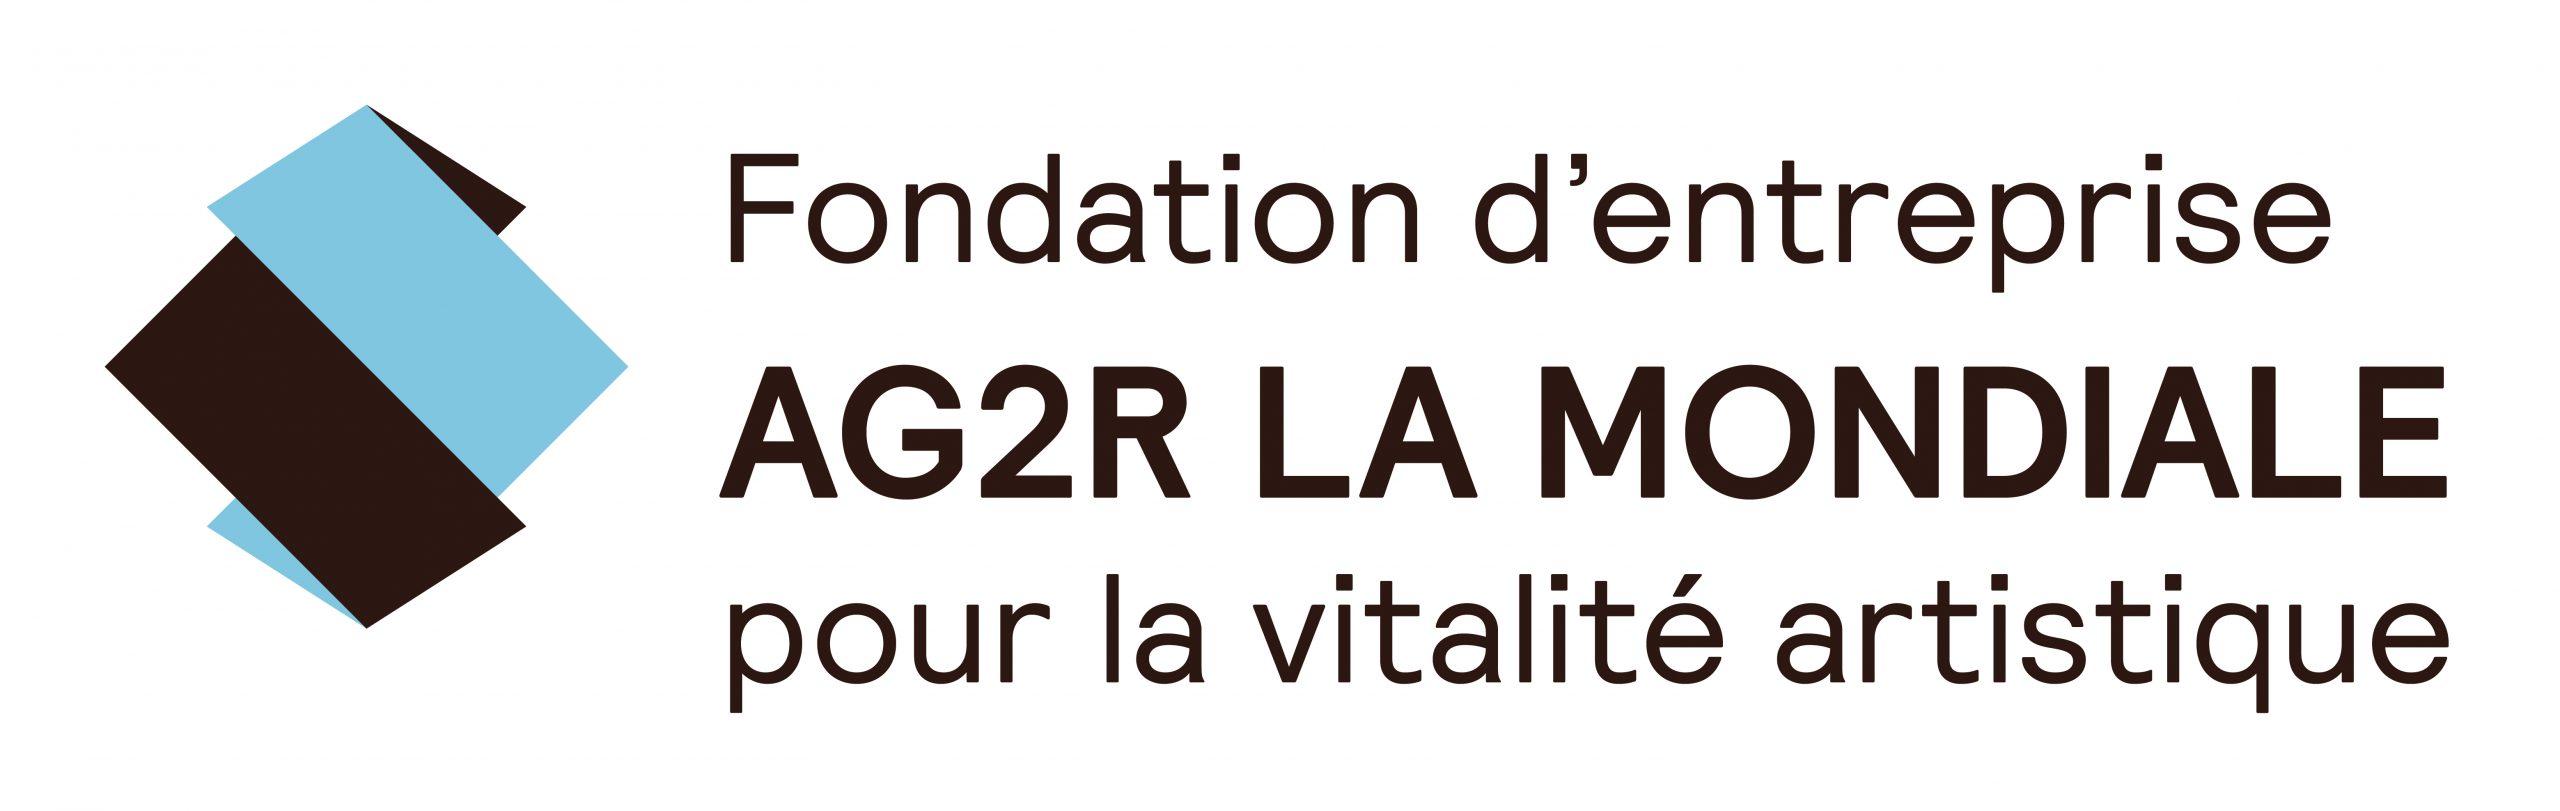 Fondation AG2R